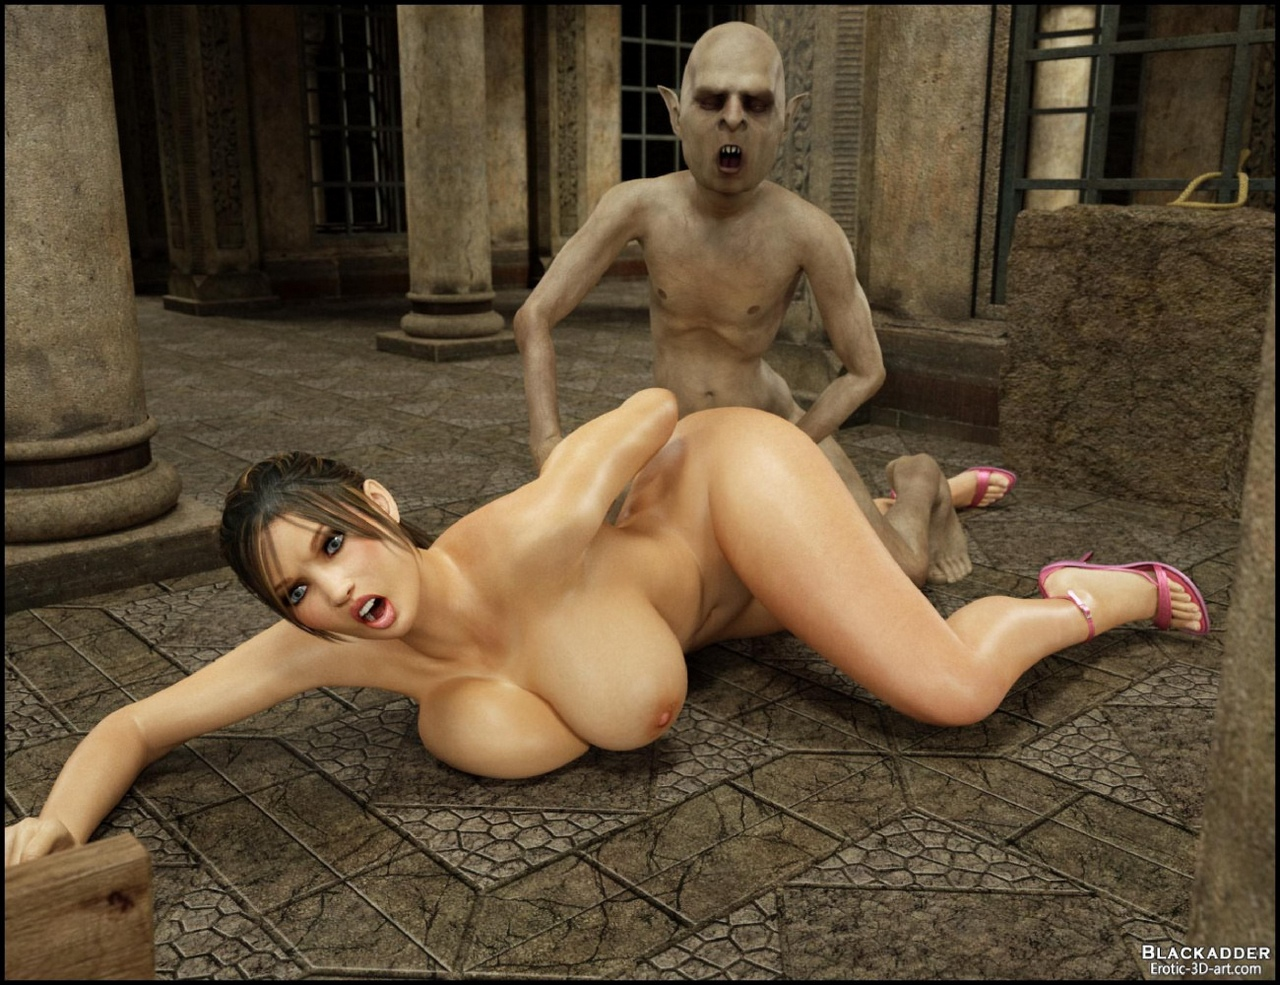 Pornomonster3d naked image